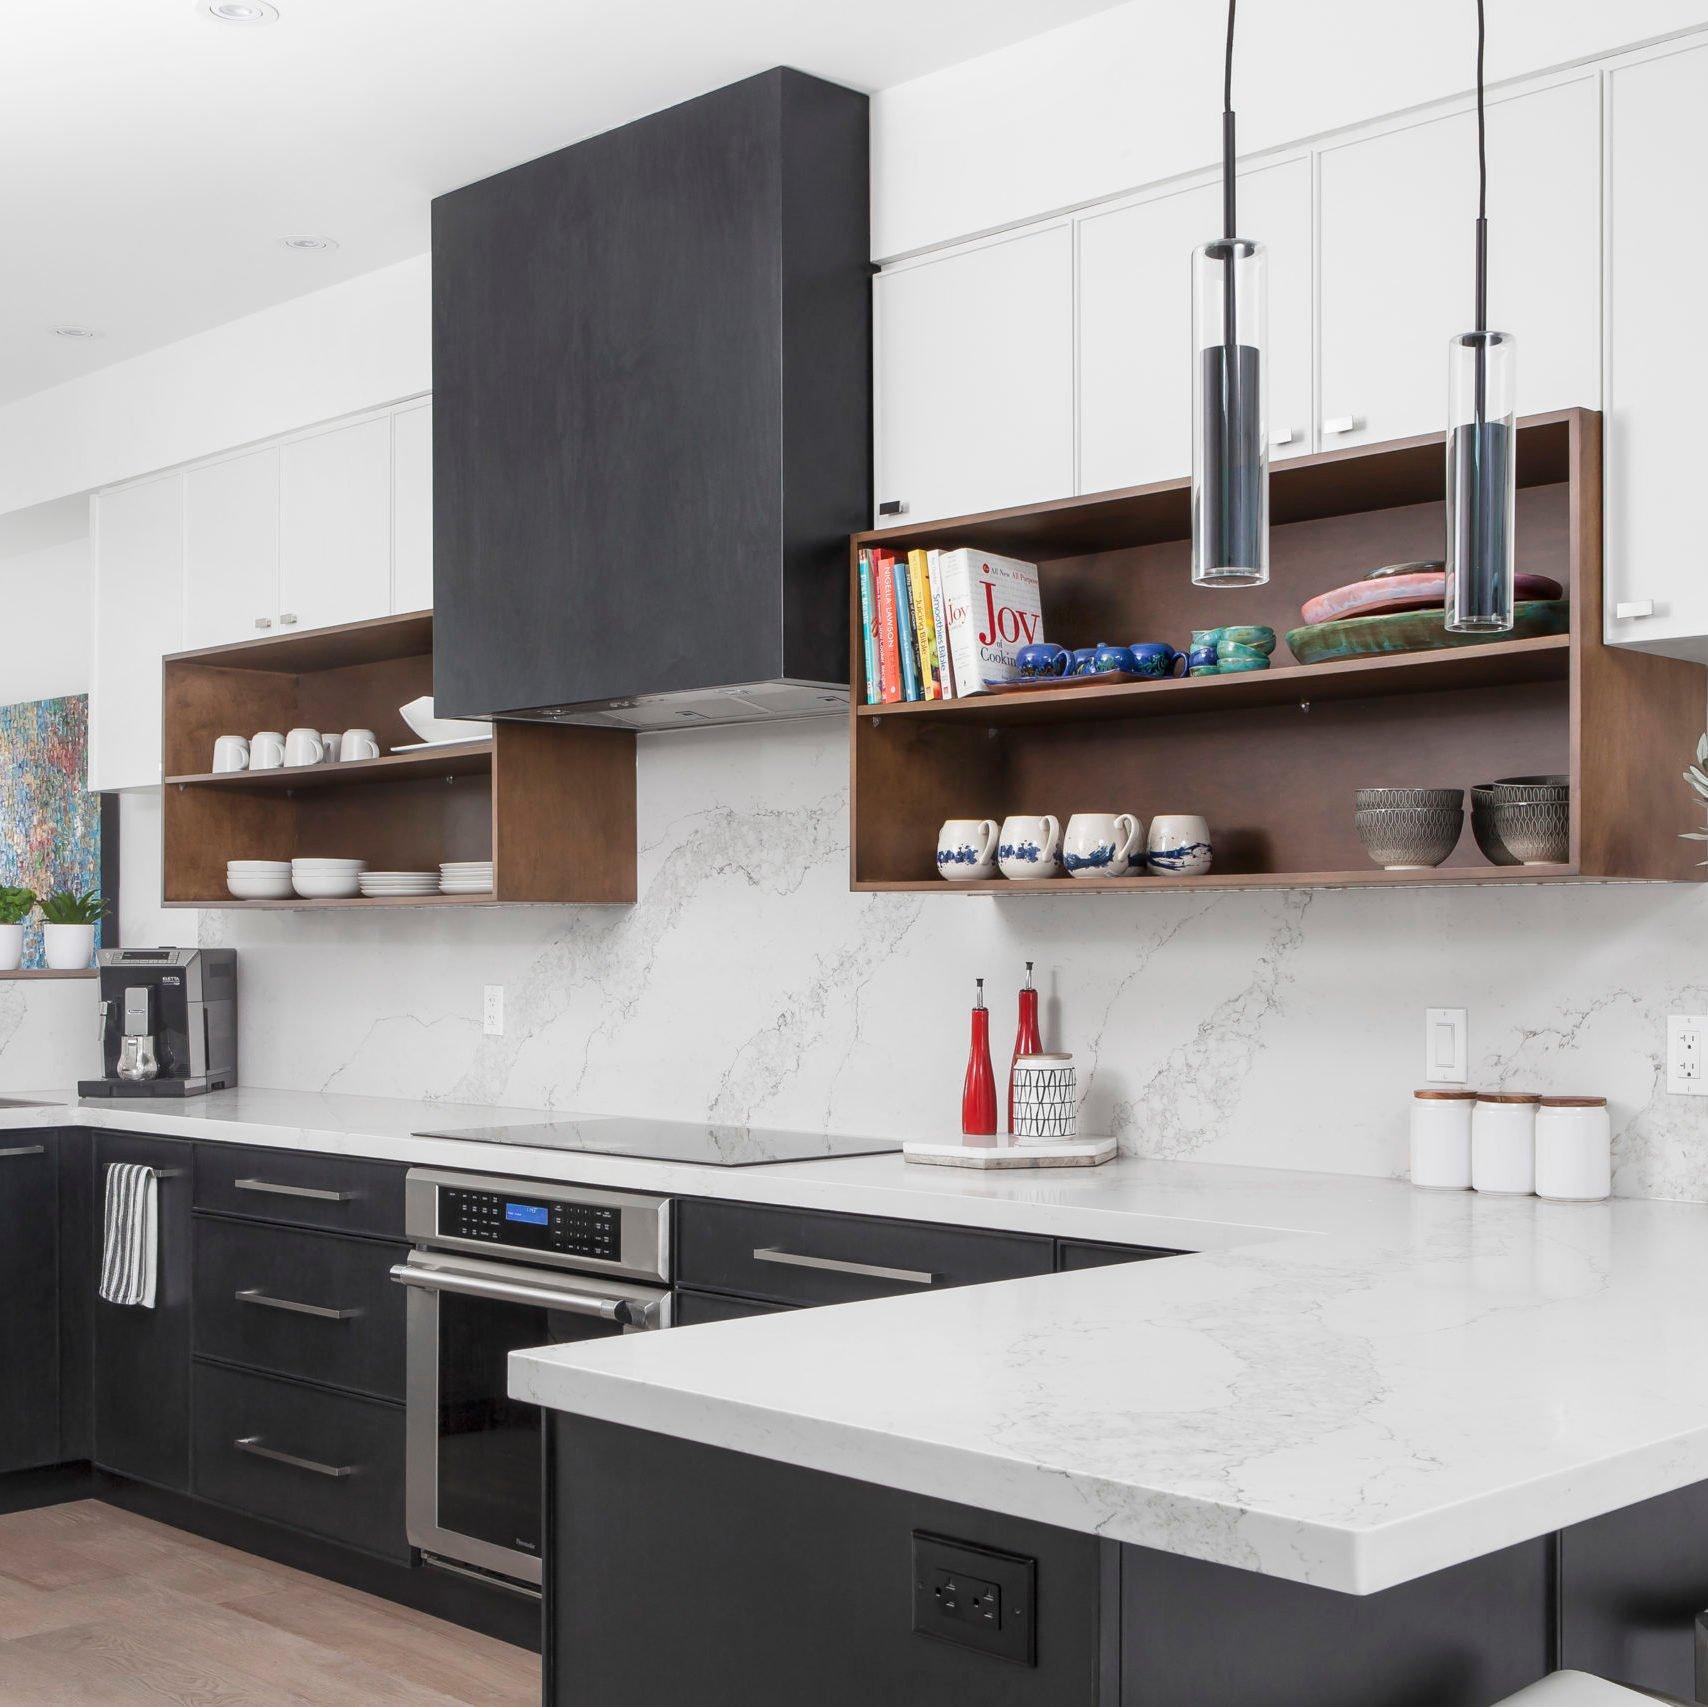 Silver—Kitchen Under $50K, Rotem Golan aceofspaceinteriors.com